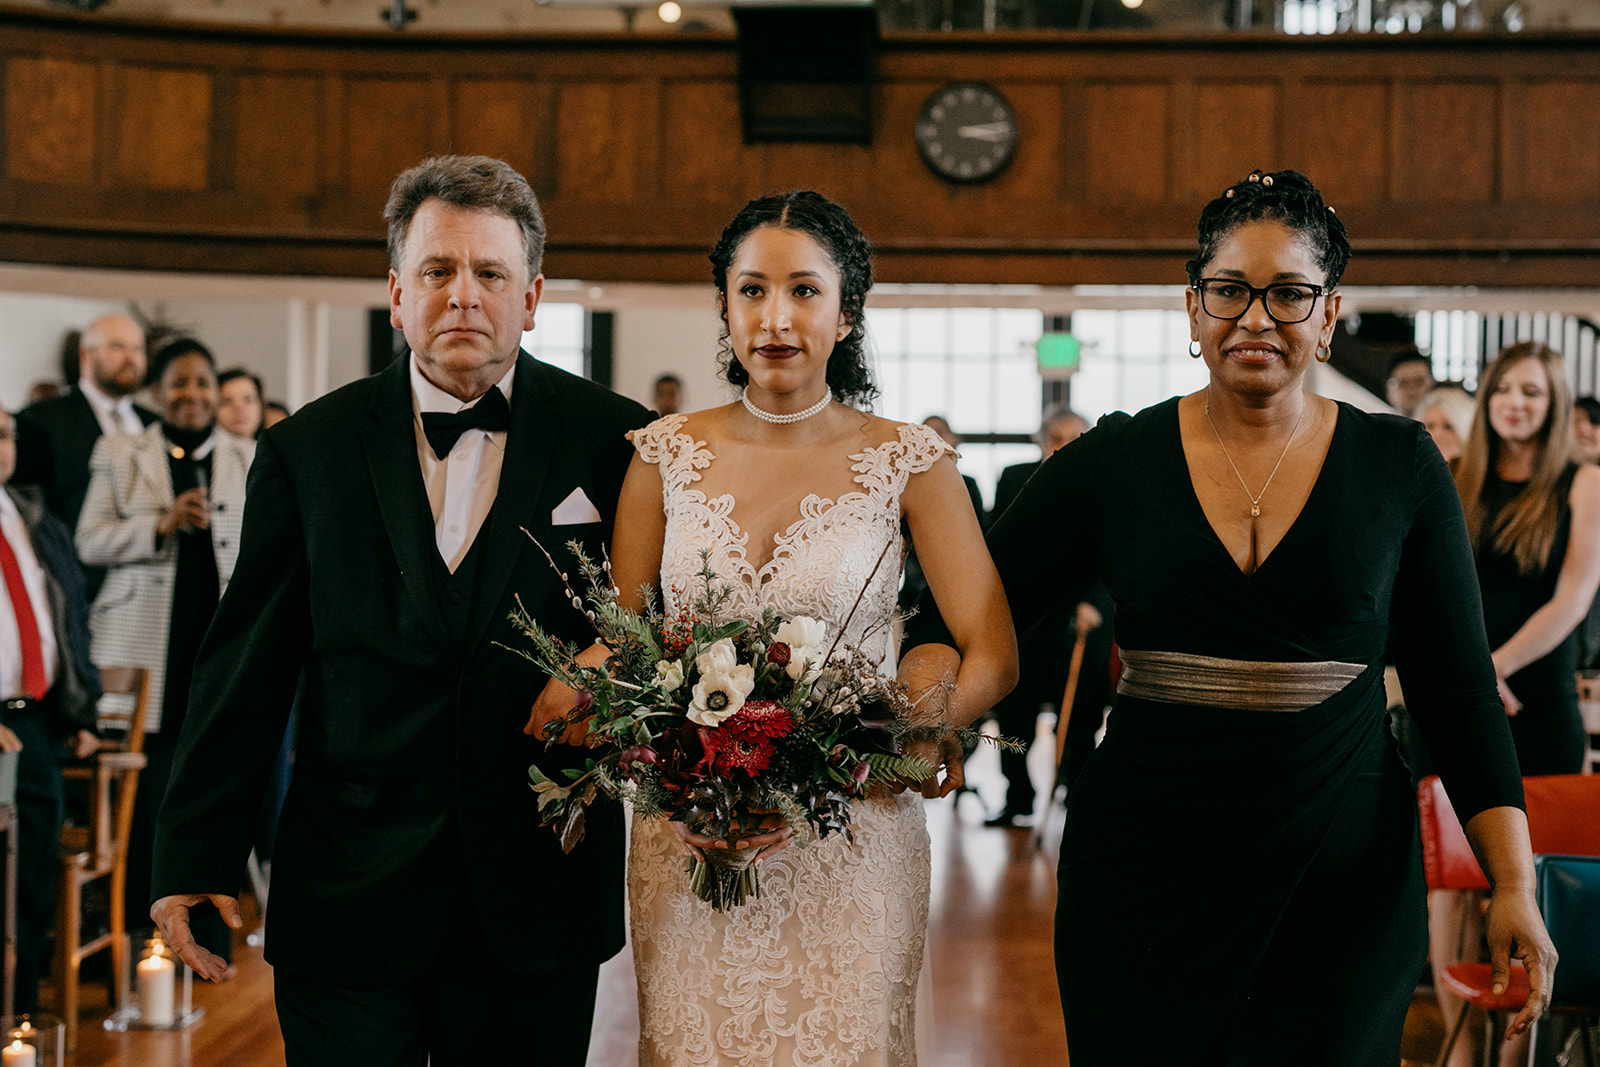 portland - wedding - photographer - doorofhopechurch438.jpg